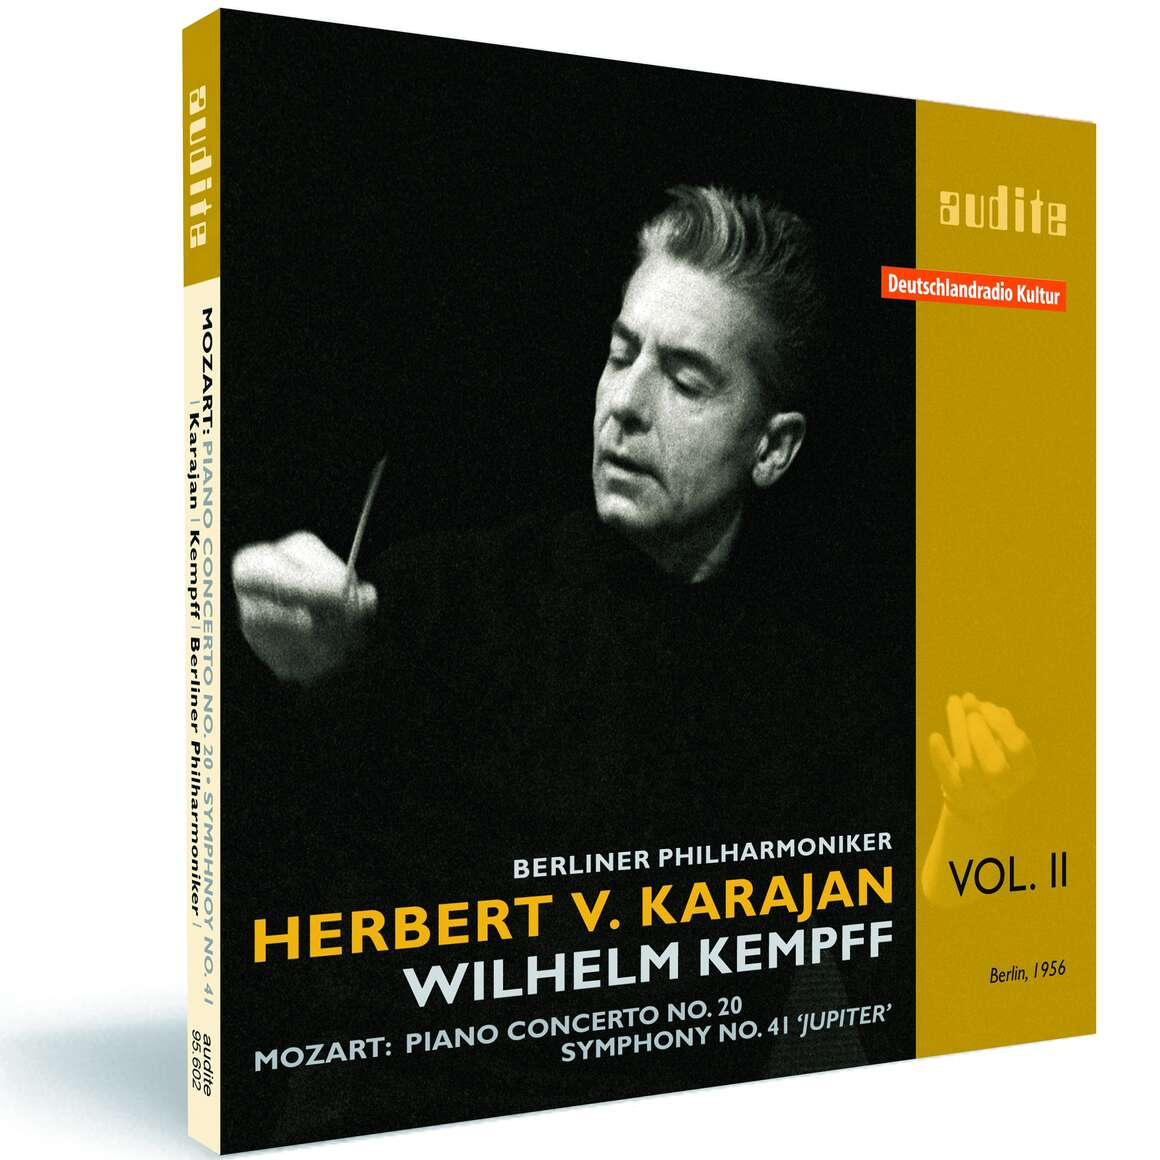 Edition von Karajan (II) – W. A. Mozart: Piano Concerto No. 20 & Symphony No. 41 'Jupiter Symphony'